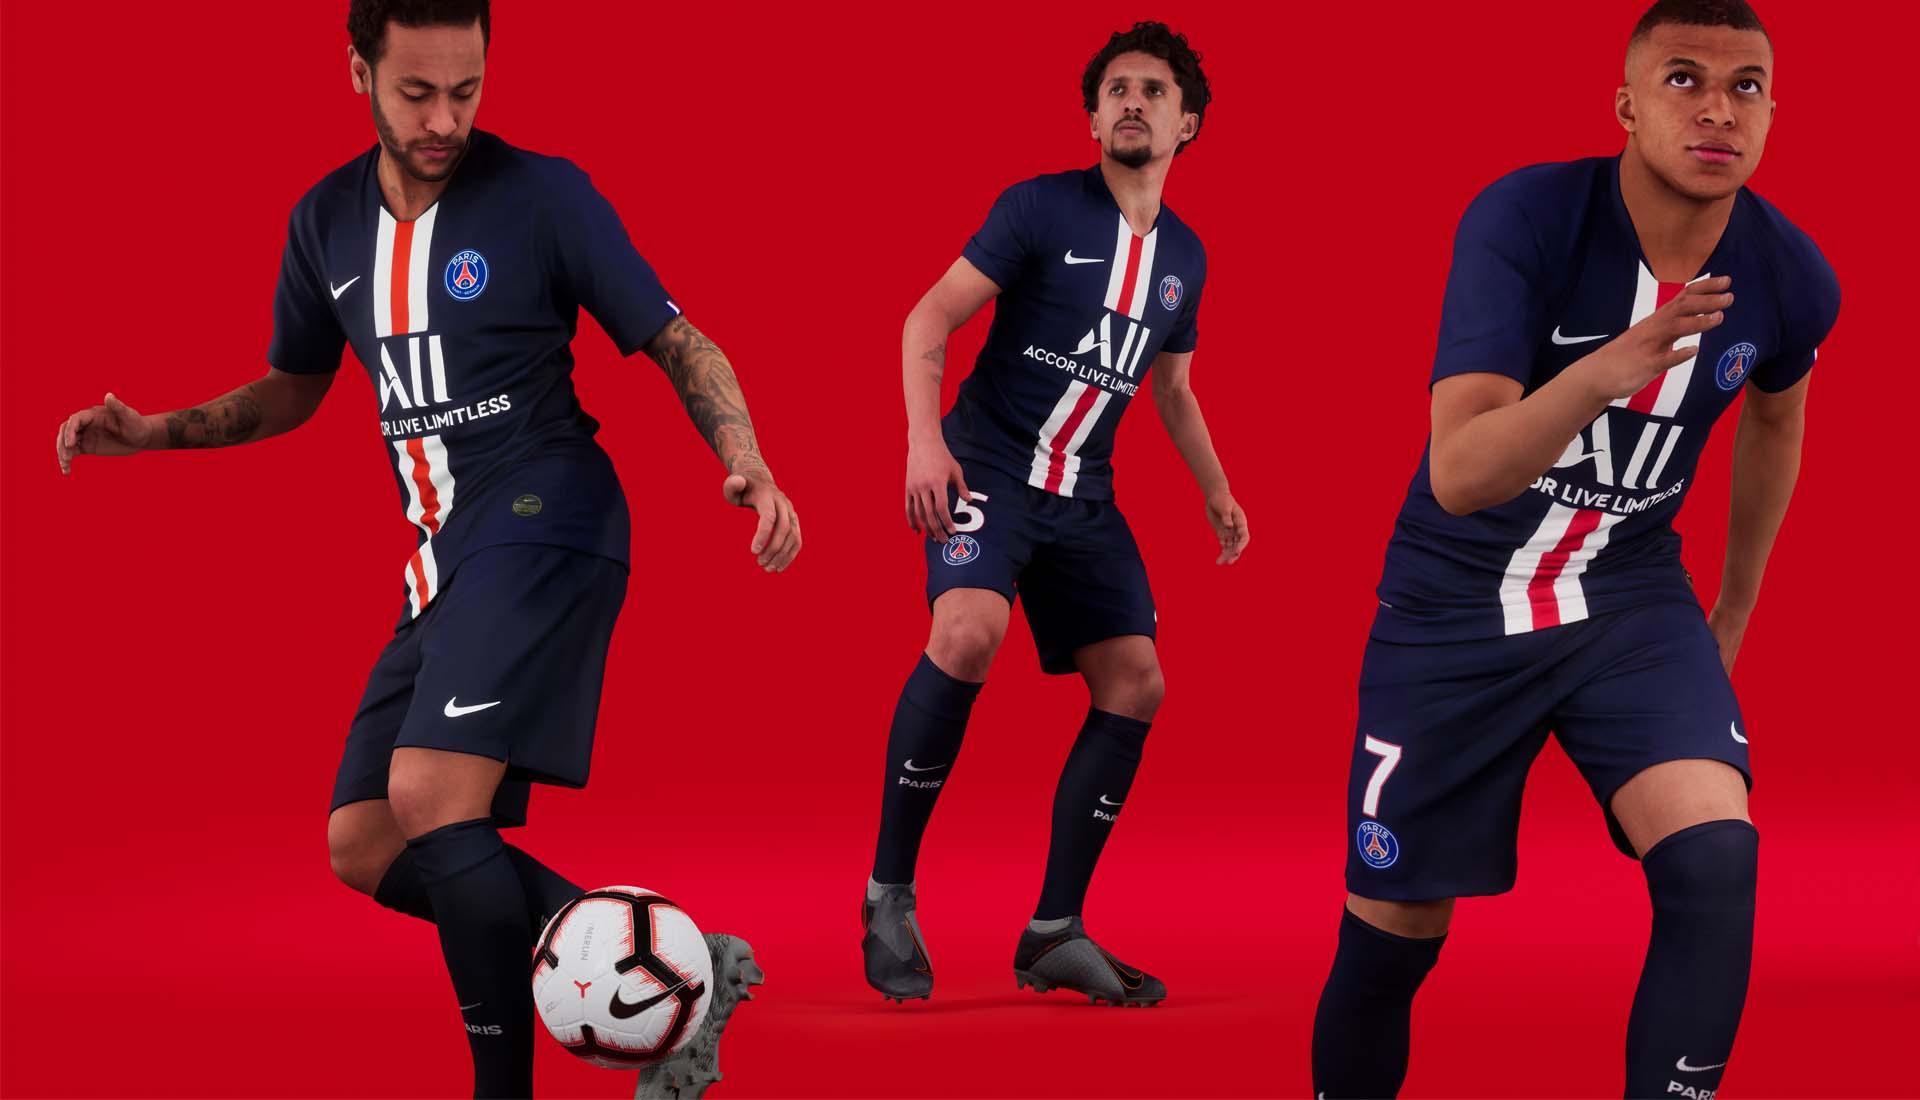 quality design e32e4 eee38 Nike Launch PSG 2019/20 Home Shirt - SoccerBible